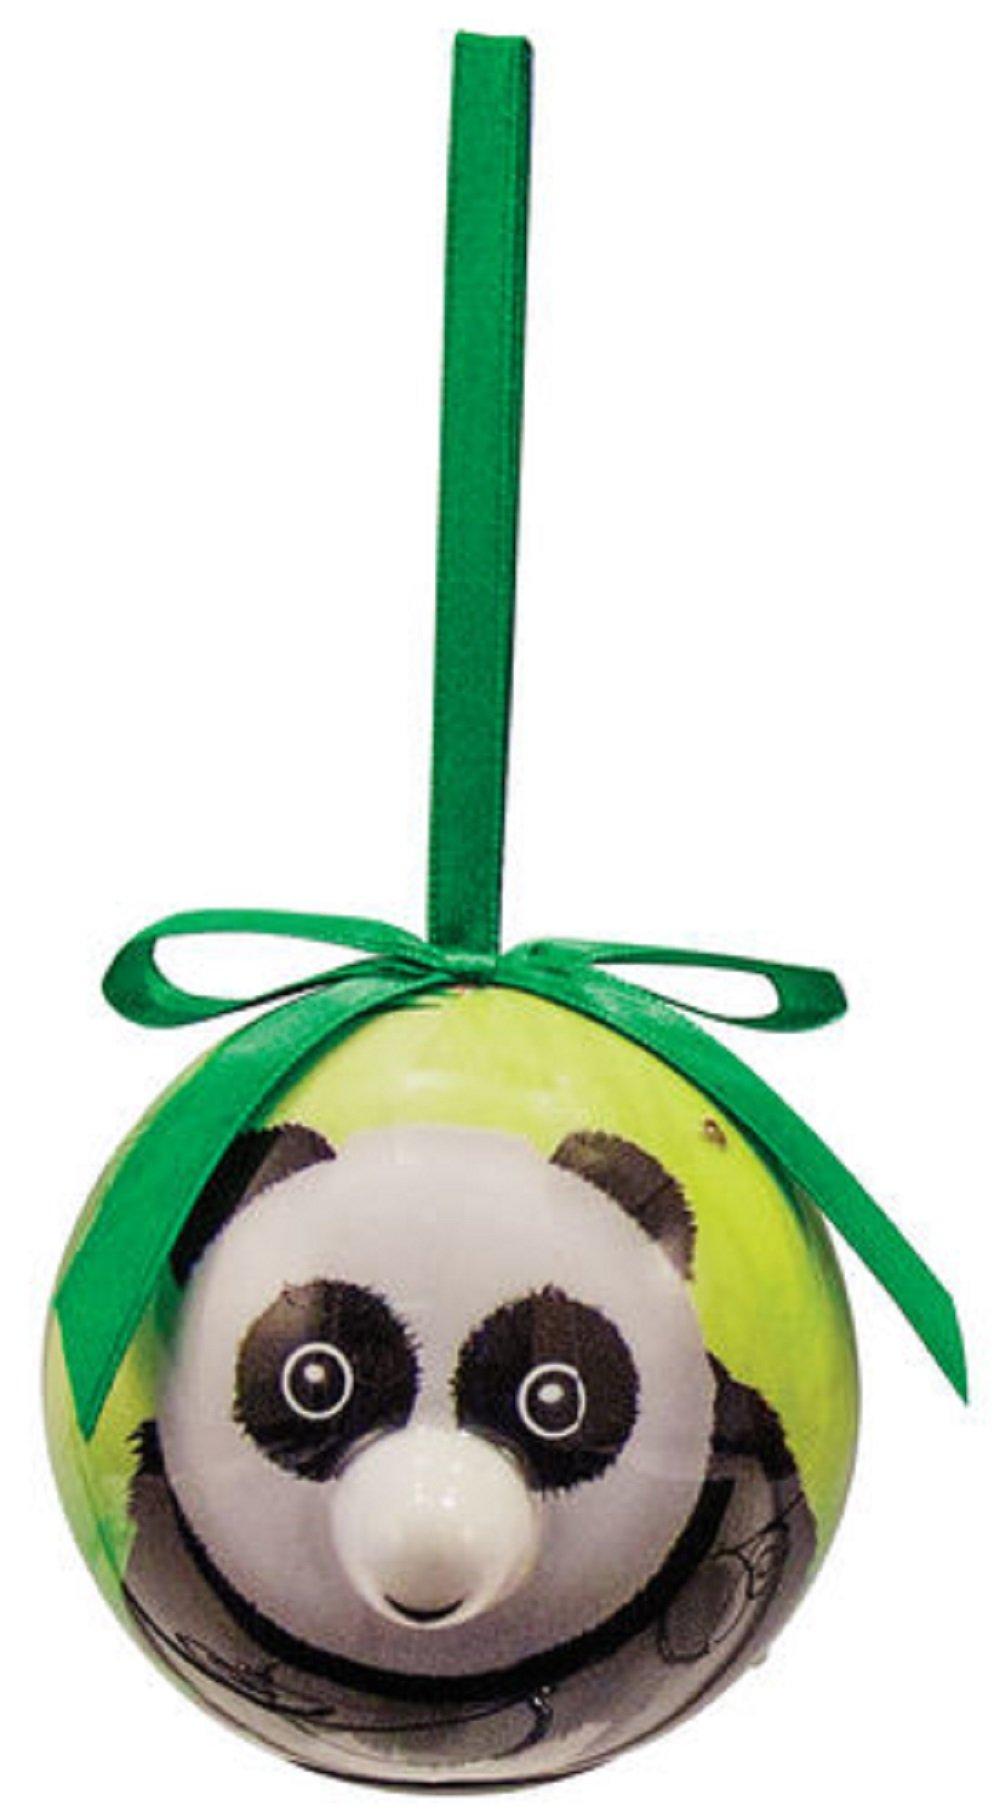 D&D Distrubutions D&D Blinking Animal Christmas Ornament with Extra Batteries (Panda) by D&D Distrubutions